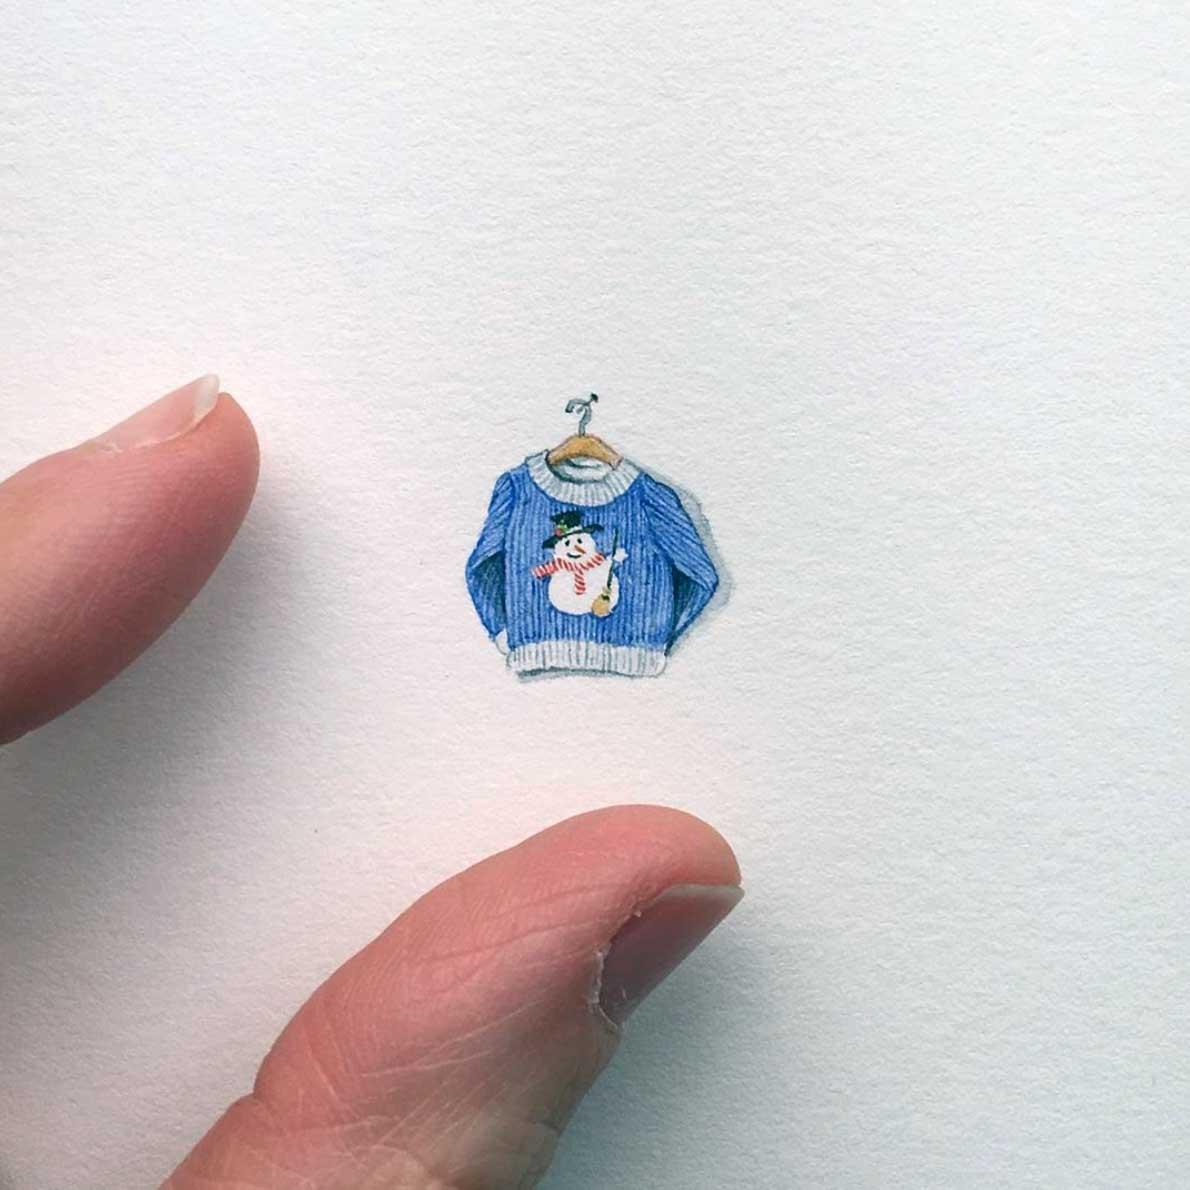 Miniatur-Gemälde von Brooke Rothshank Brooke-Rothshank-miniatur-malerei_07